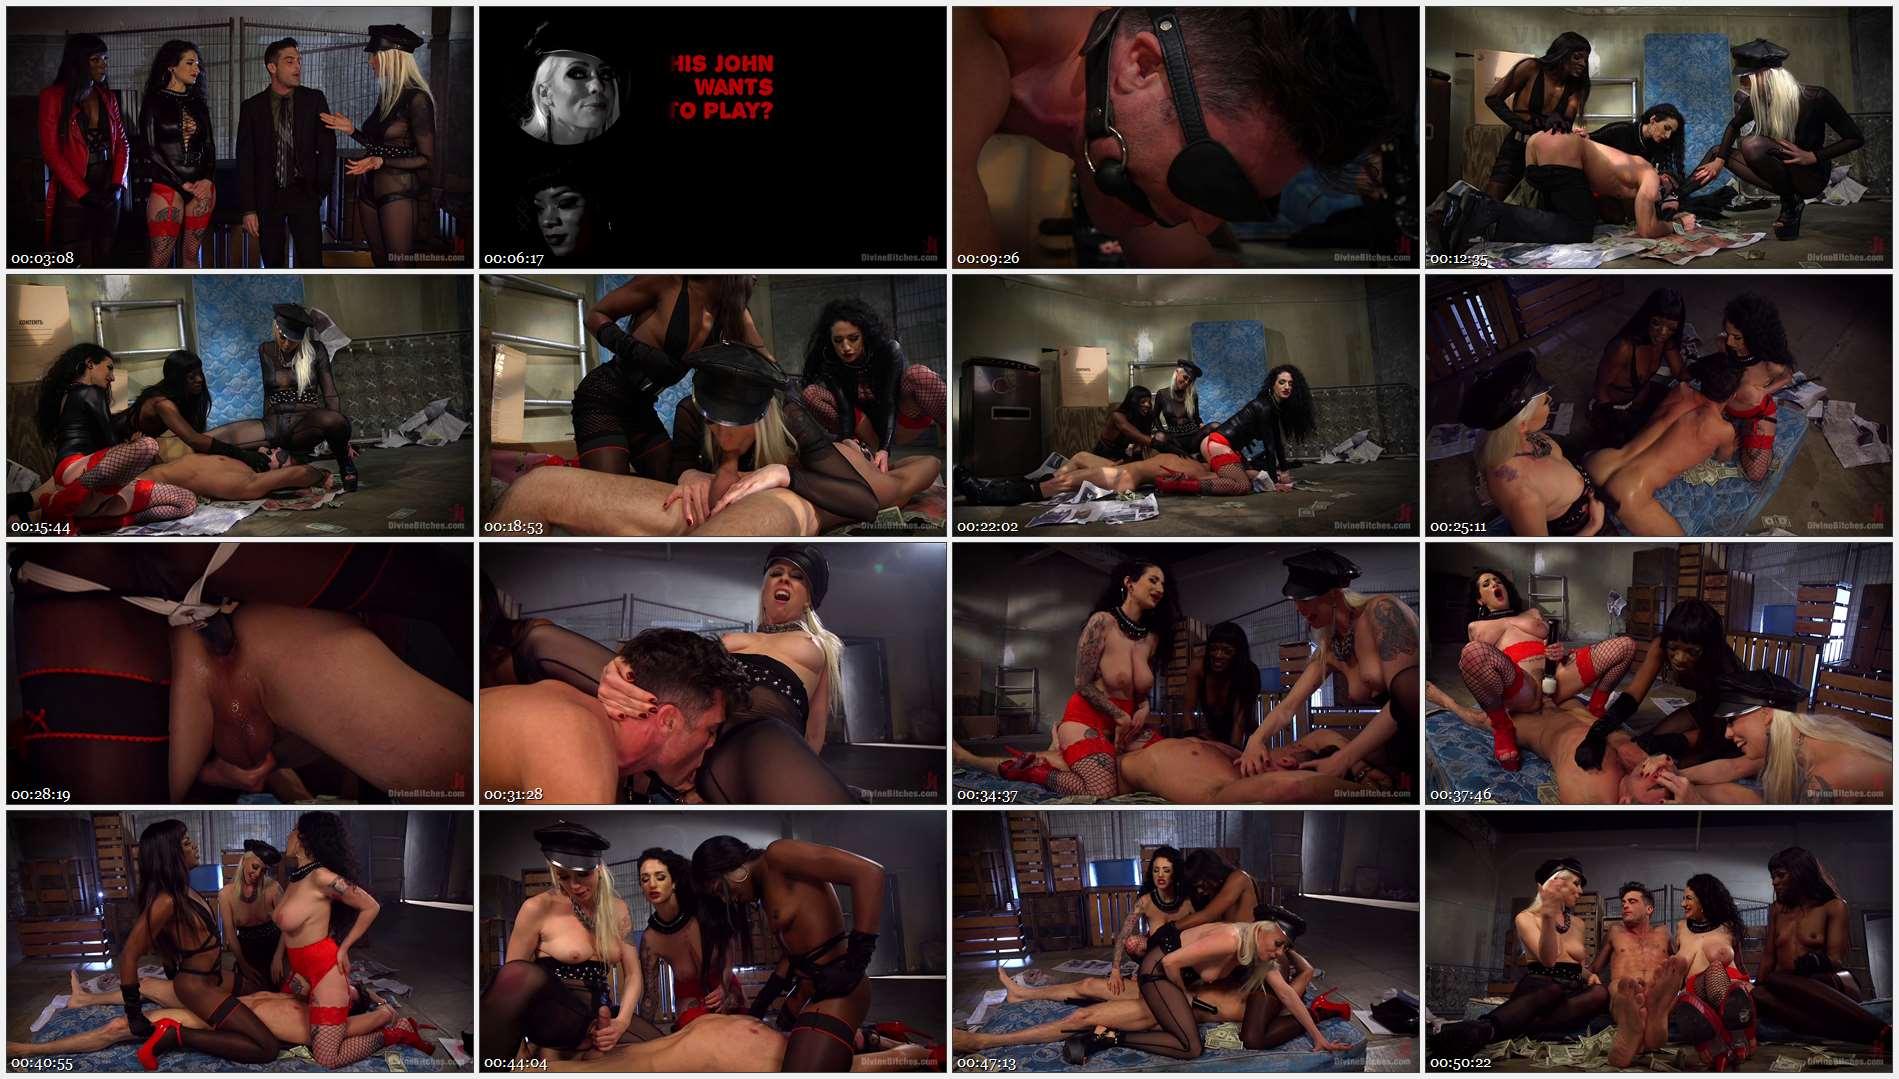 Lance Hart – Lorelei Lee – Arabelle Raphael – Ana Foxxx – City of Sin: Entitled John Brought Down a Peg 